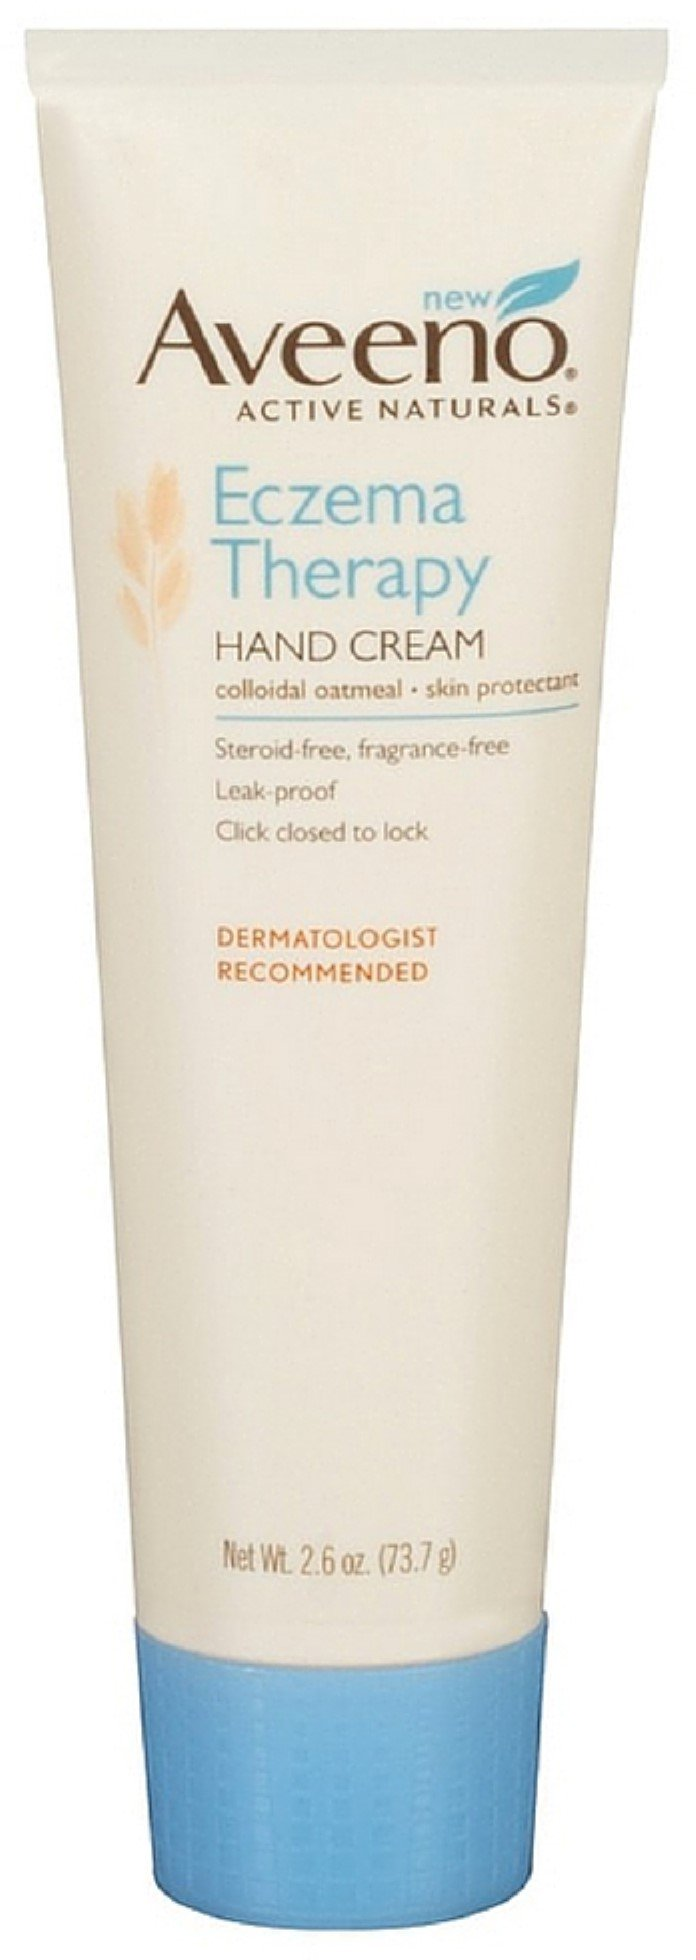 AVEENO Active Naturals Eczema Therapy Hand Cream 2.60 oz (Pack of 6) by Aveeno